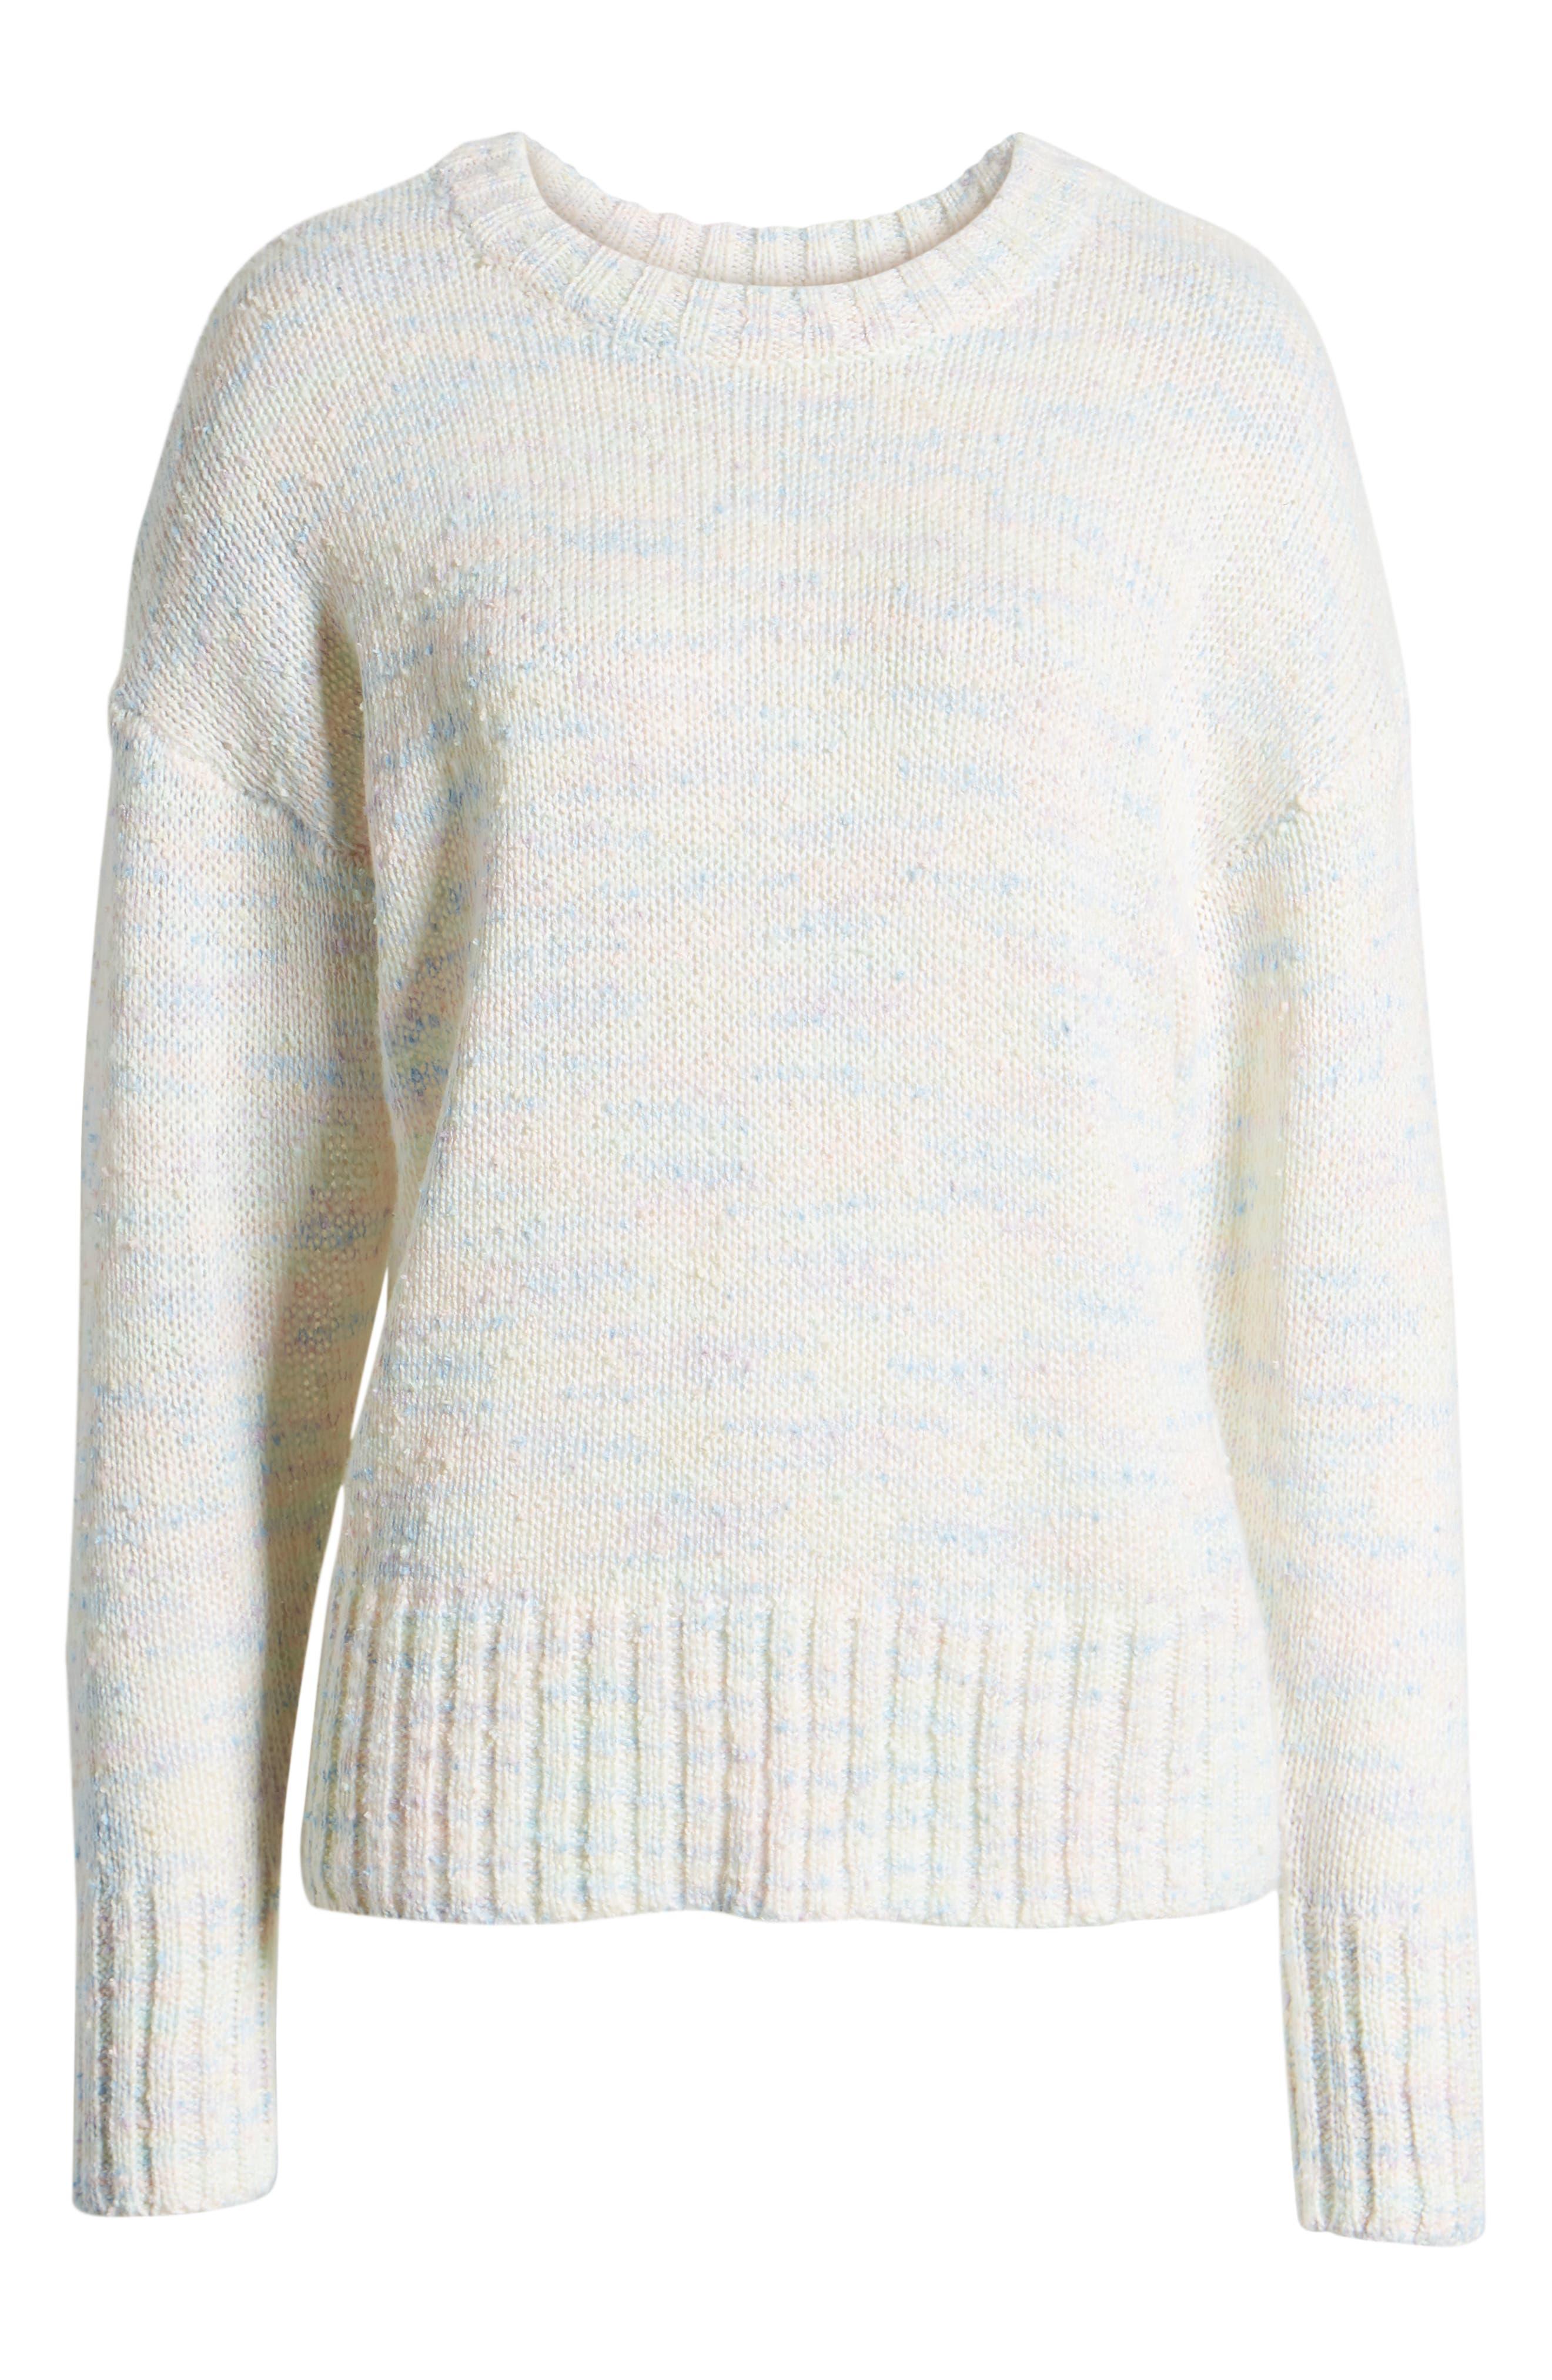 SOMETHING NAVY, Crewneck Sweater, Alternate thumbnail 7, color, IVORY COMBO